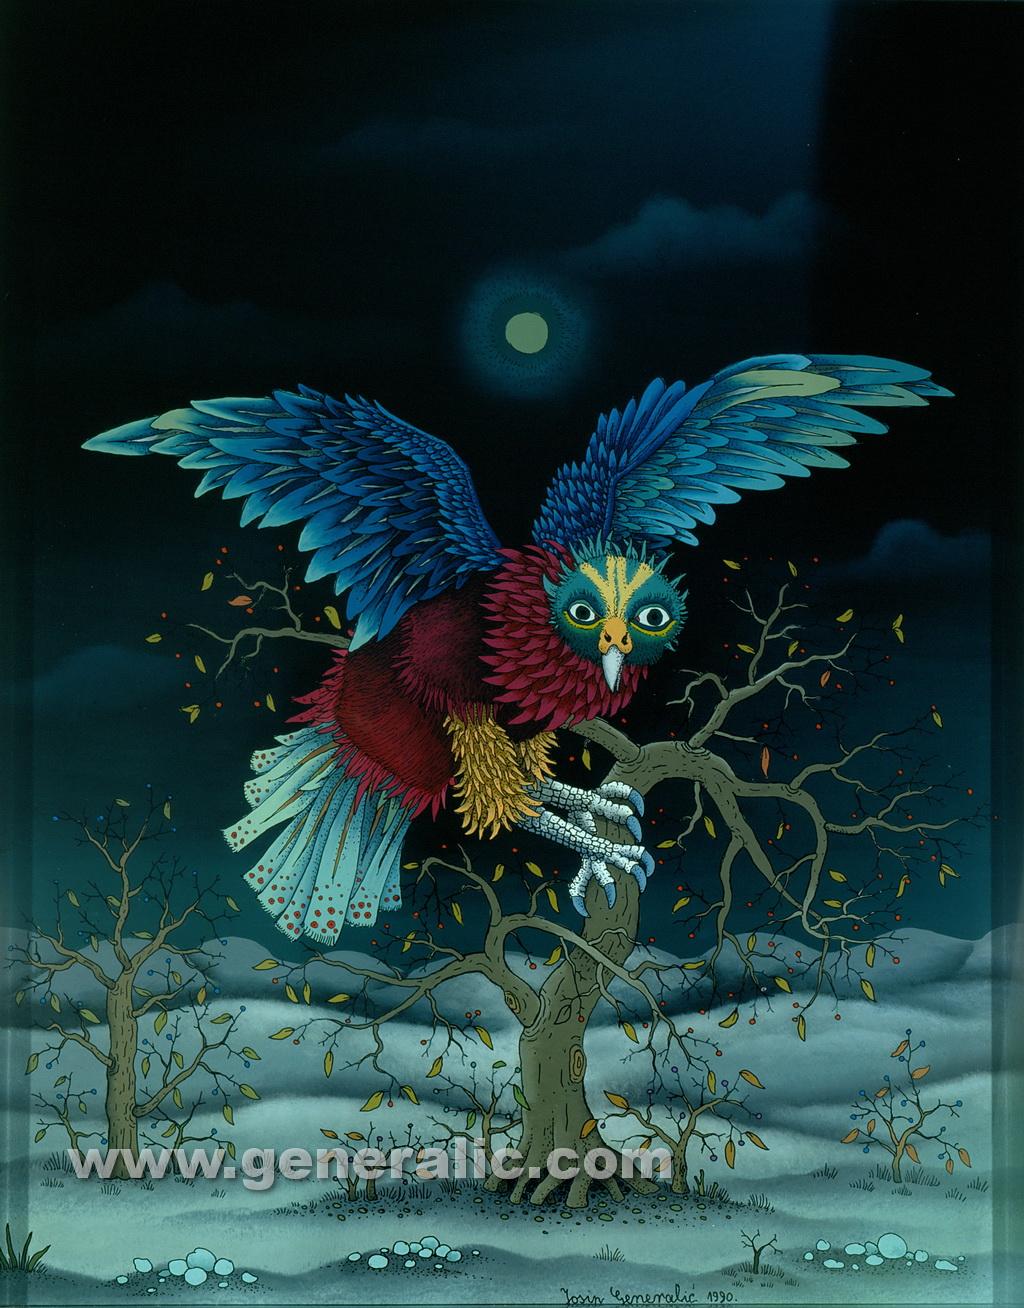 Josip Generalic, 1990, Night owl, oil on glass